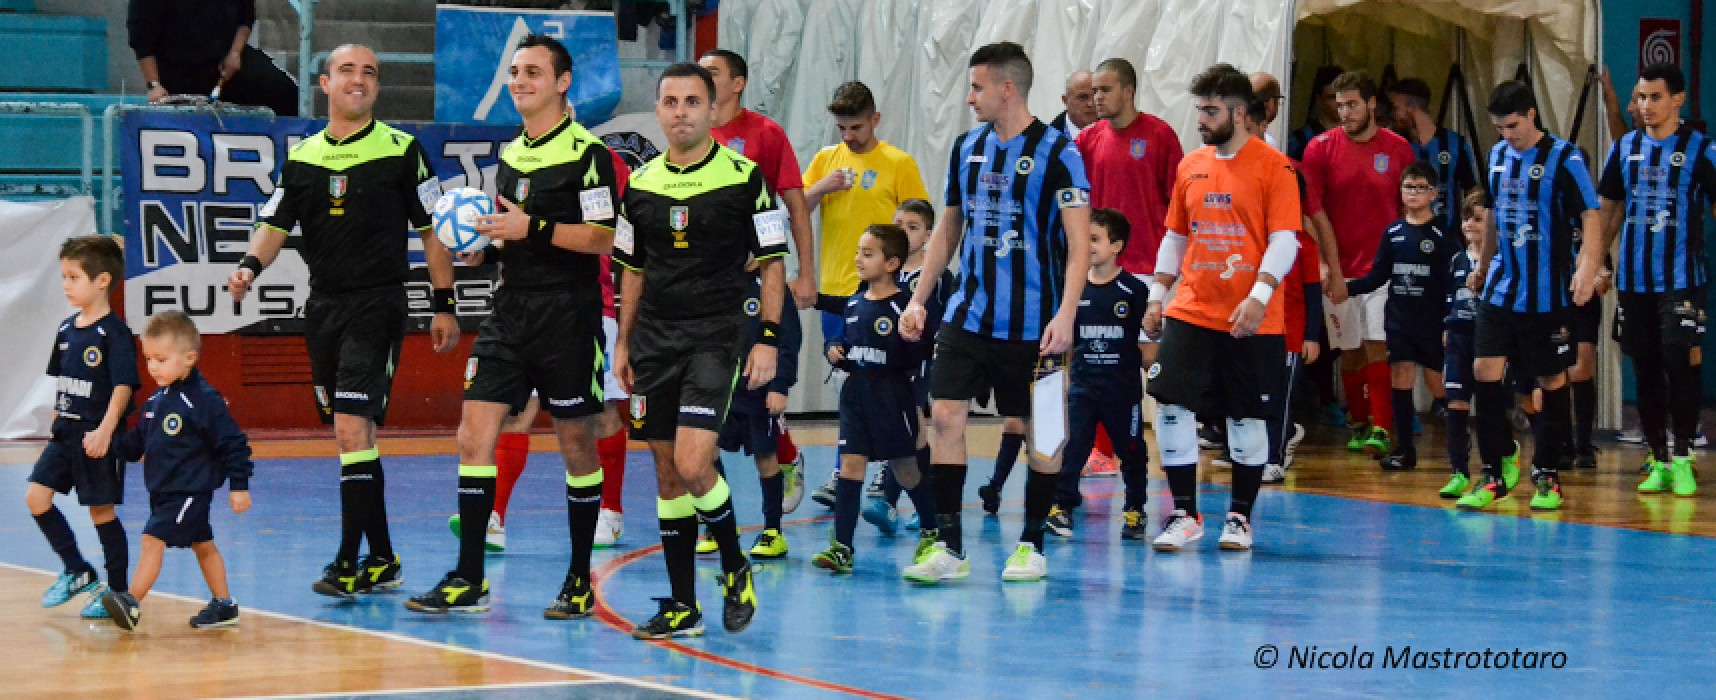 FINALE: Golden Eagle Partenope – Futsal Bisceglie 1-5